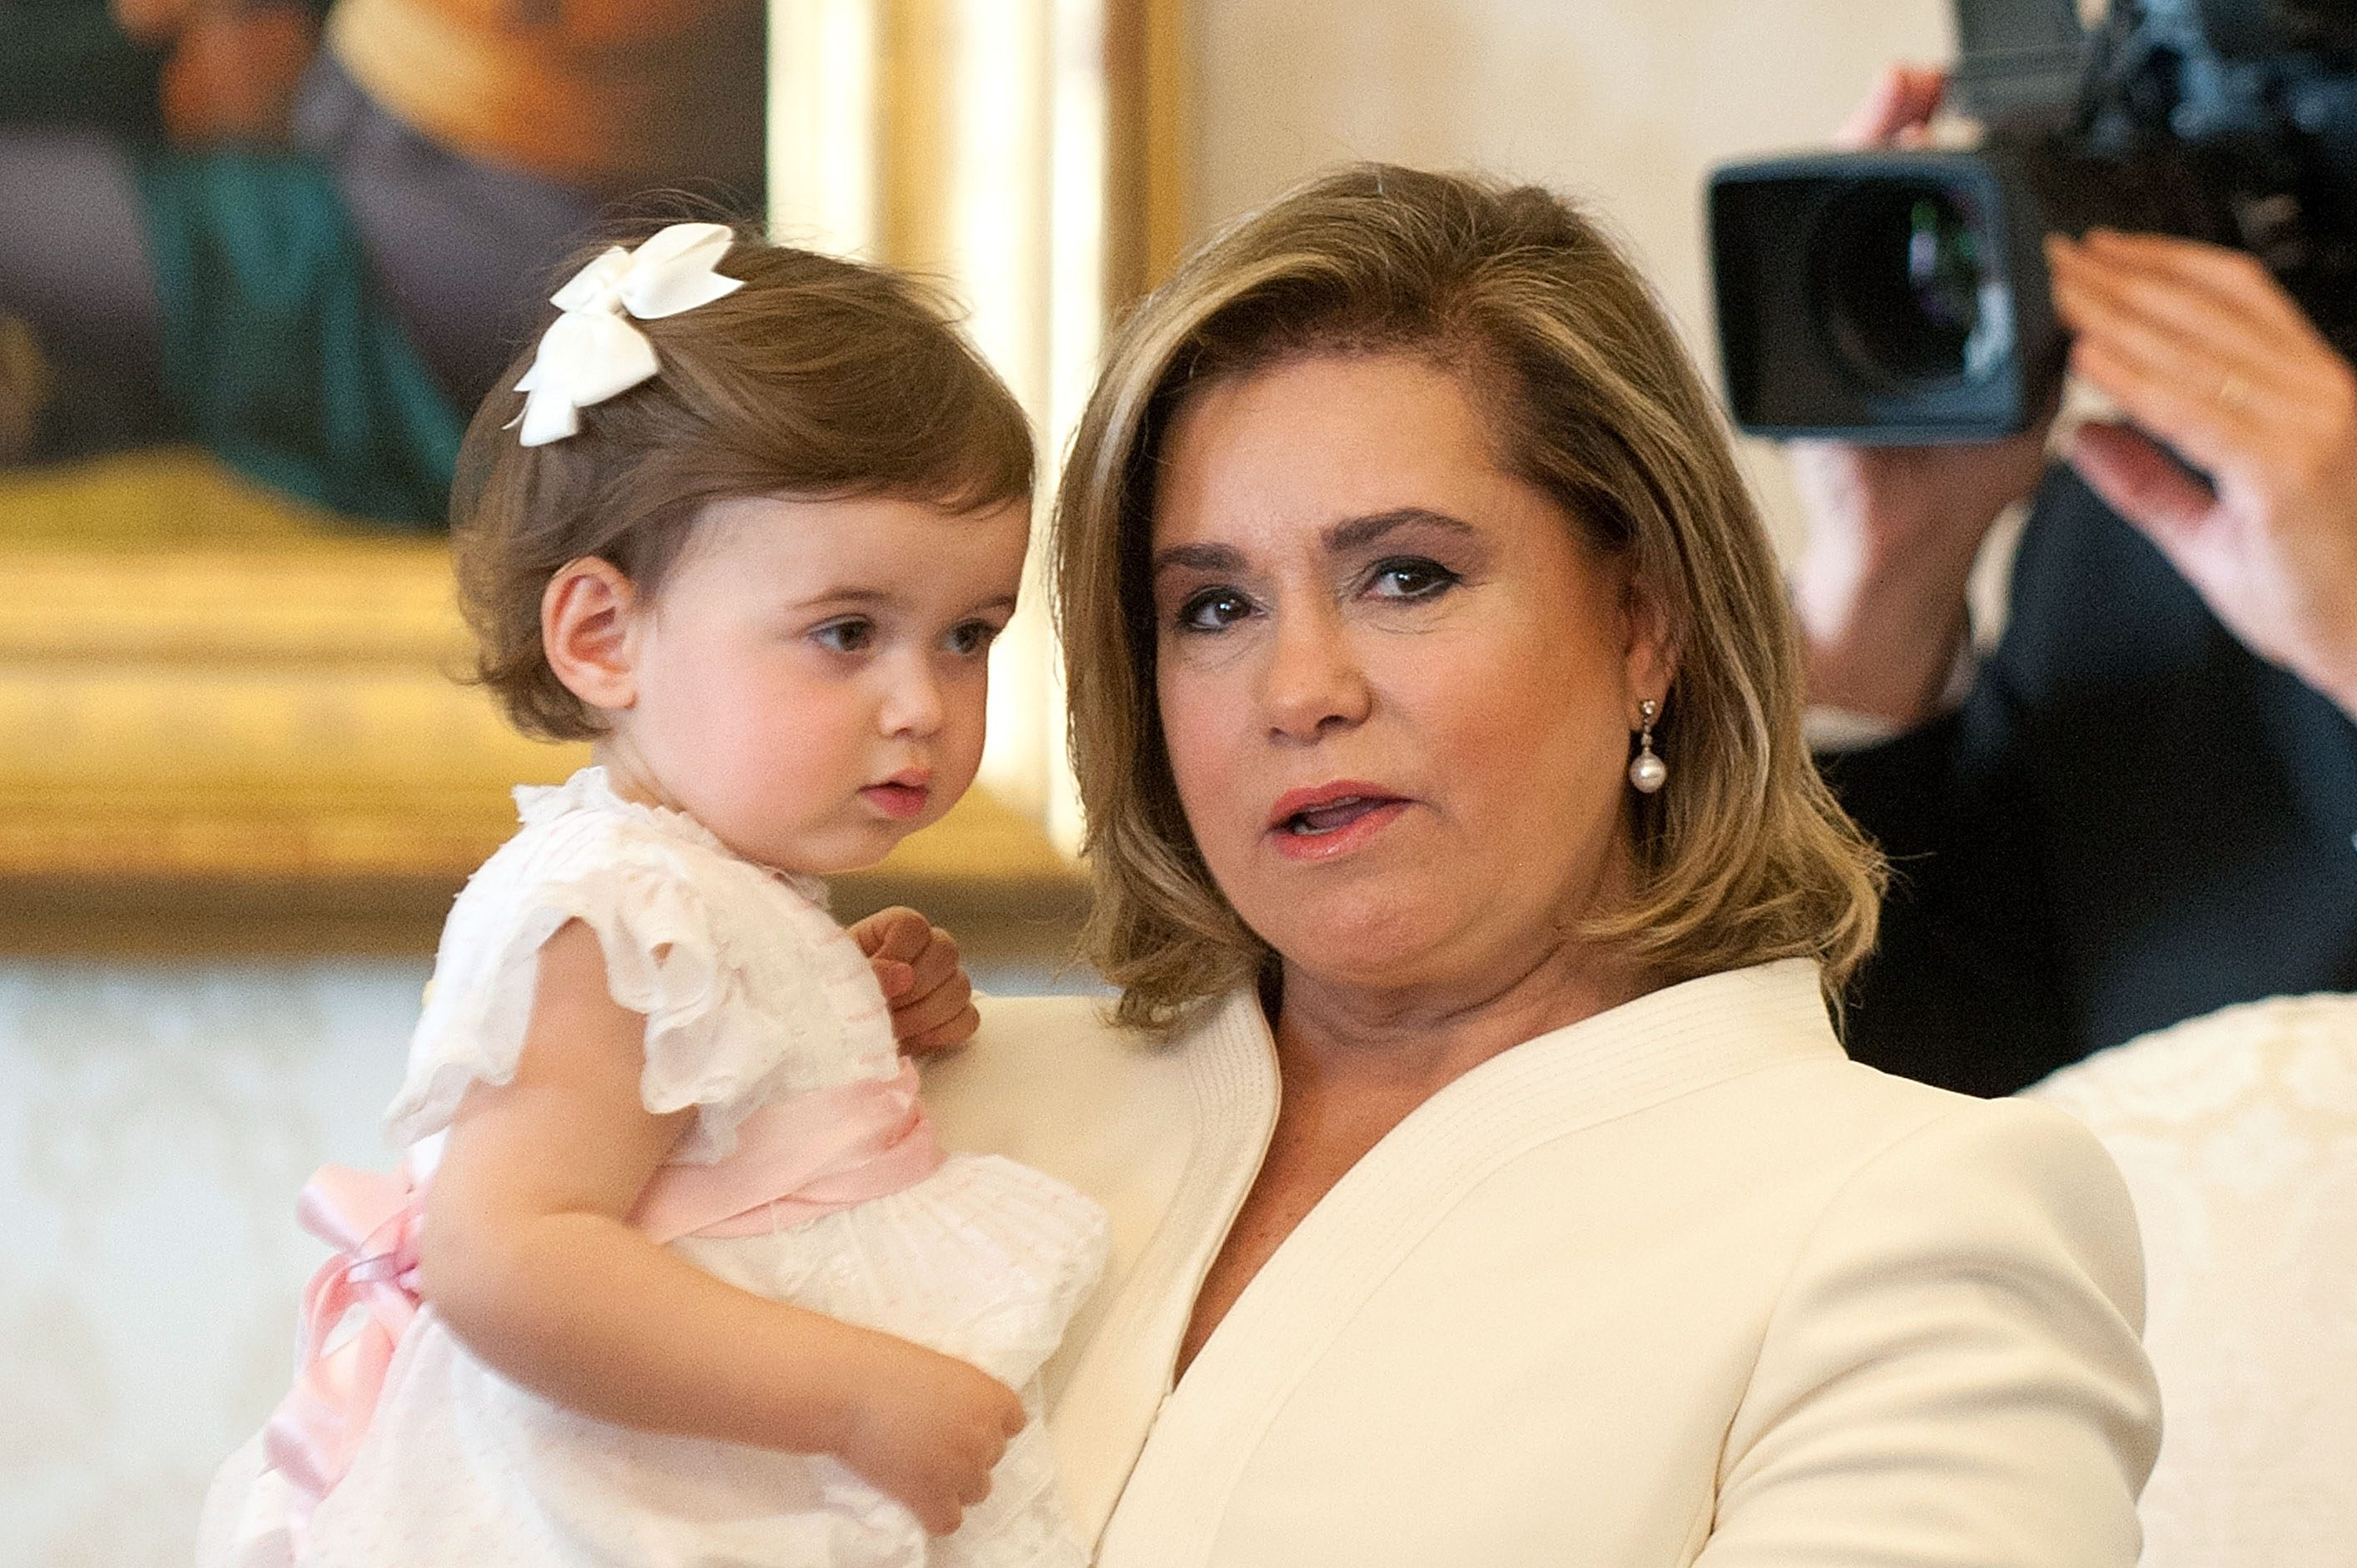 Grand Duchess Maria Teresa of Luxembourg and Princess Amalia Gabriela Maria Teresa